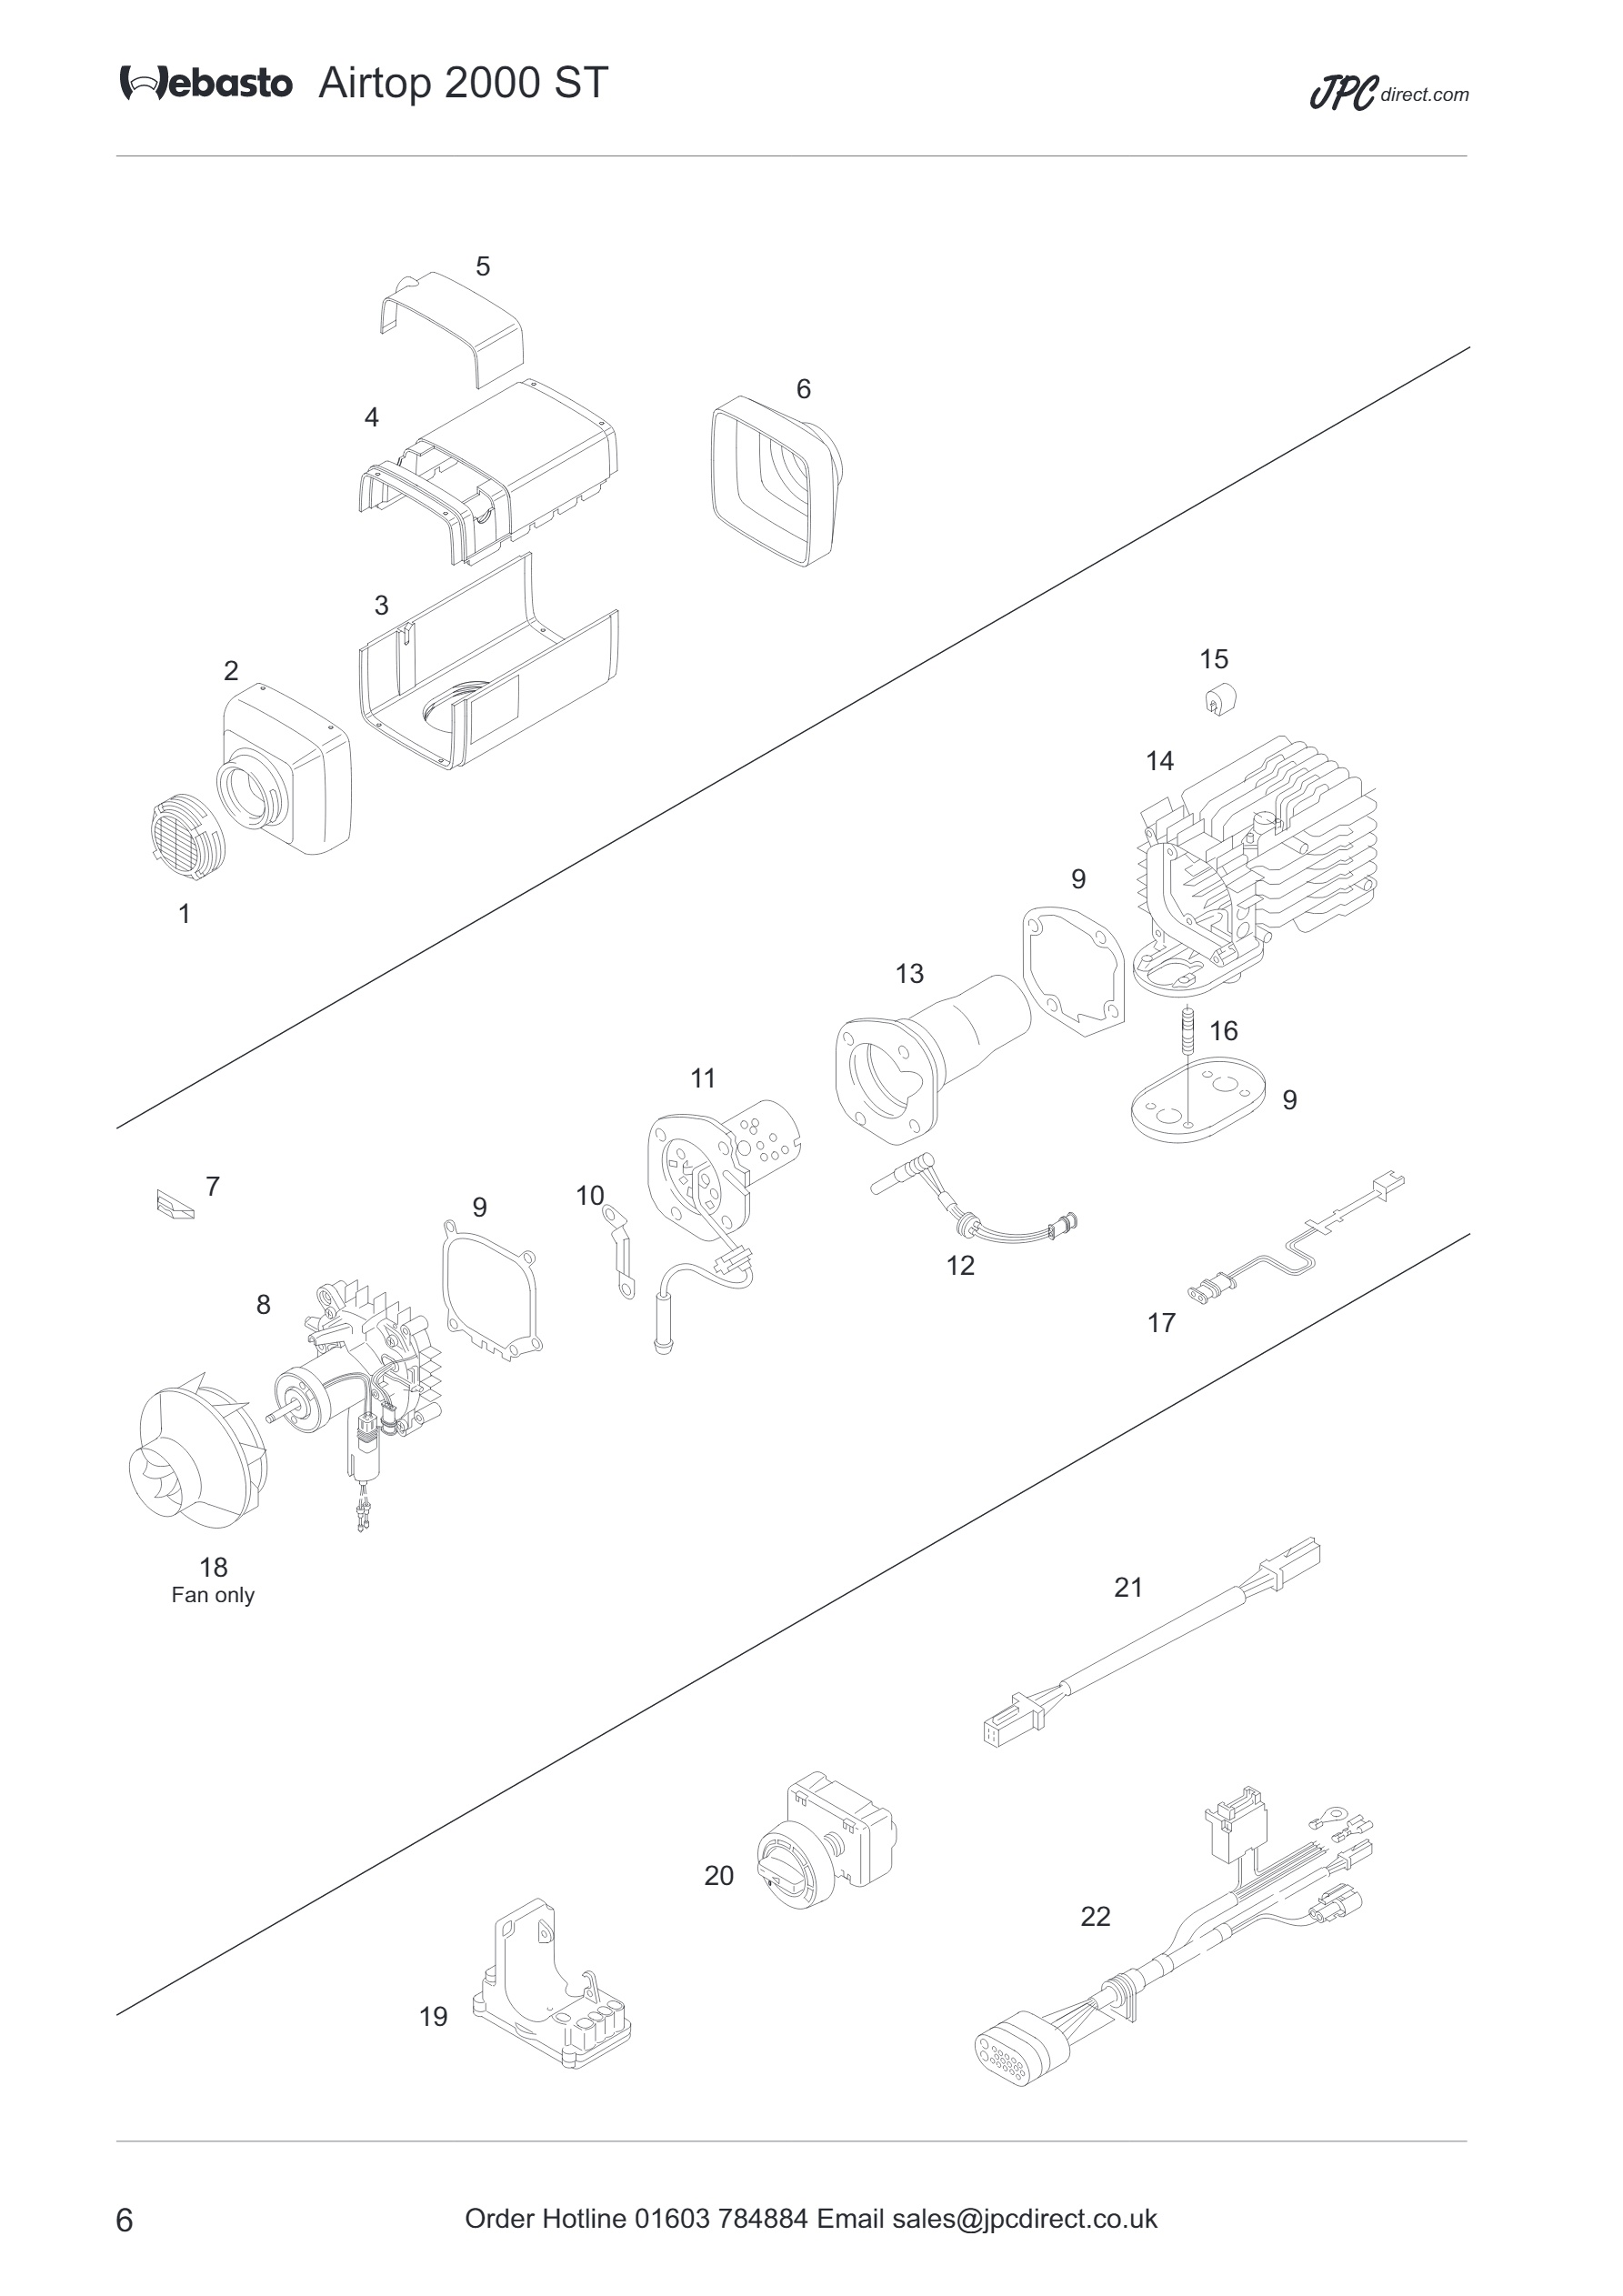 Wiring Diagram Webasto Air Top 2000